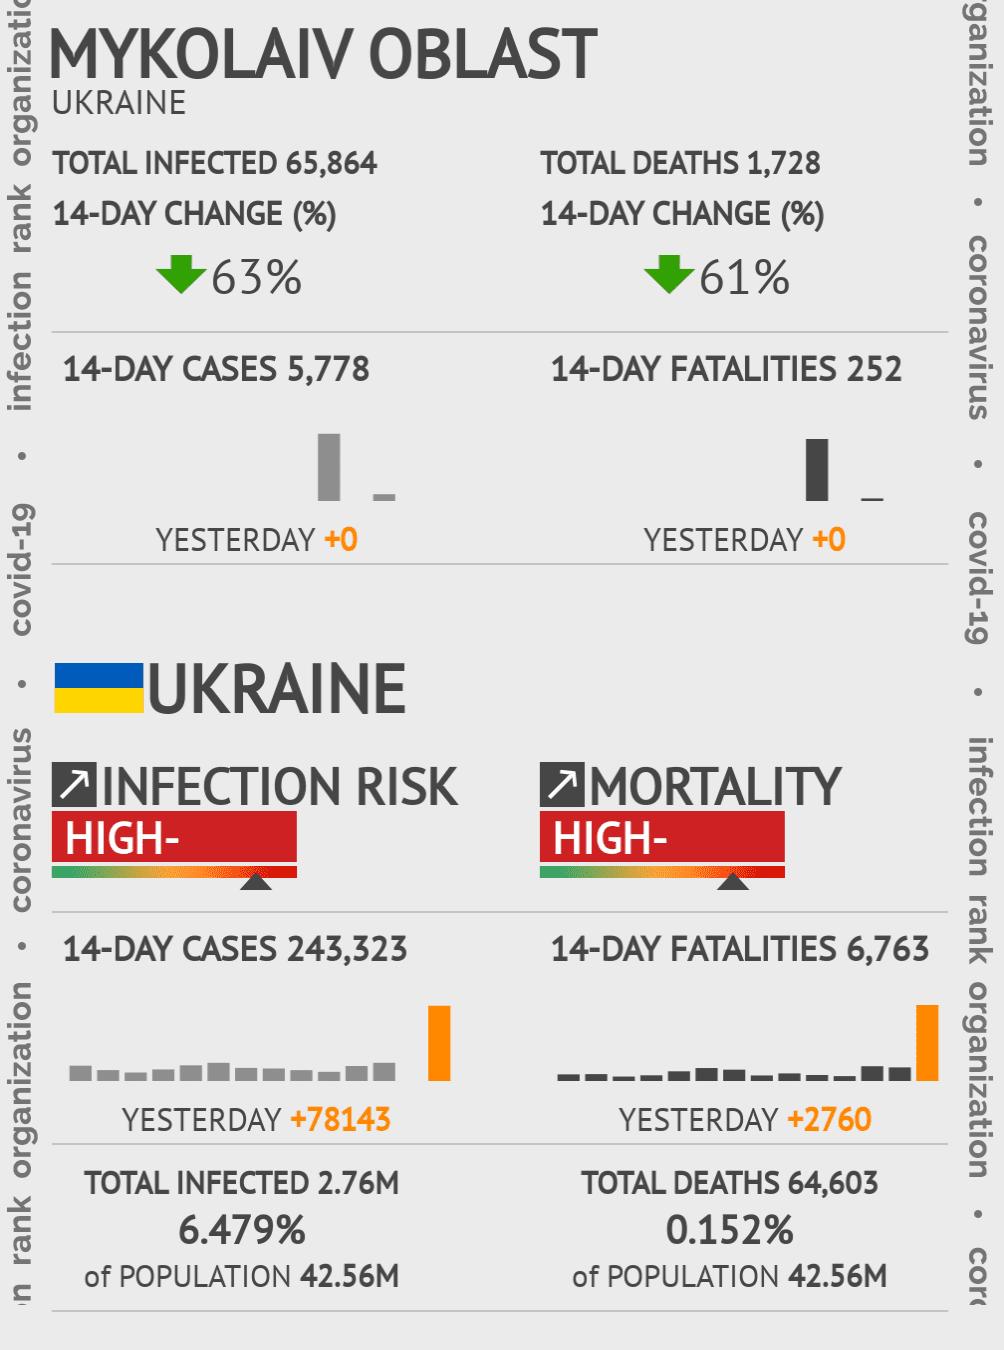 Mykolaiv Oblast Coronavirus Covid-19 Risk of Infection on March 03, 2021